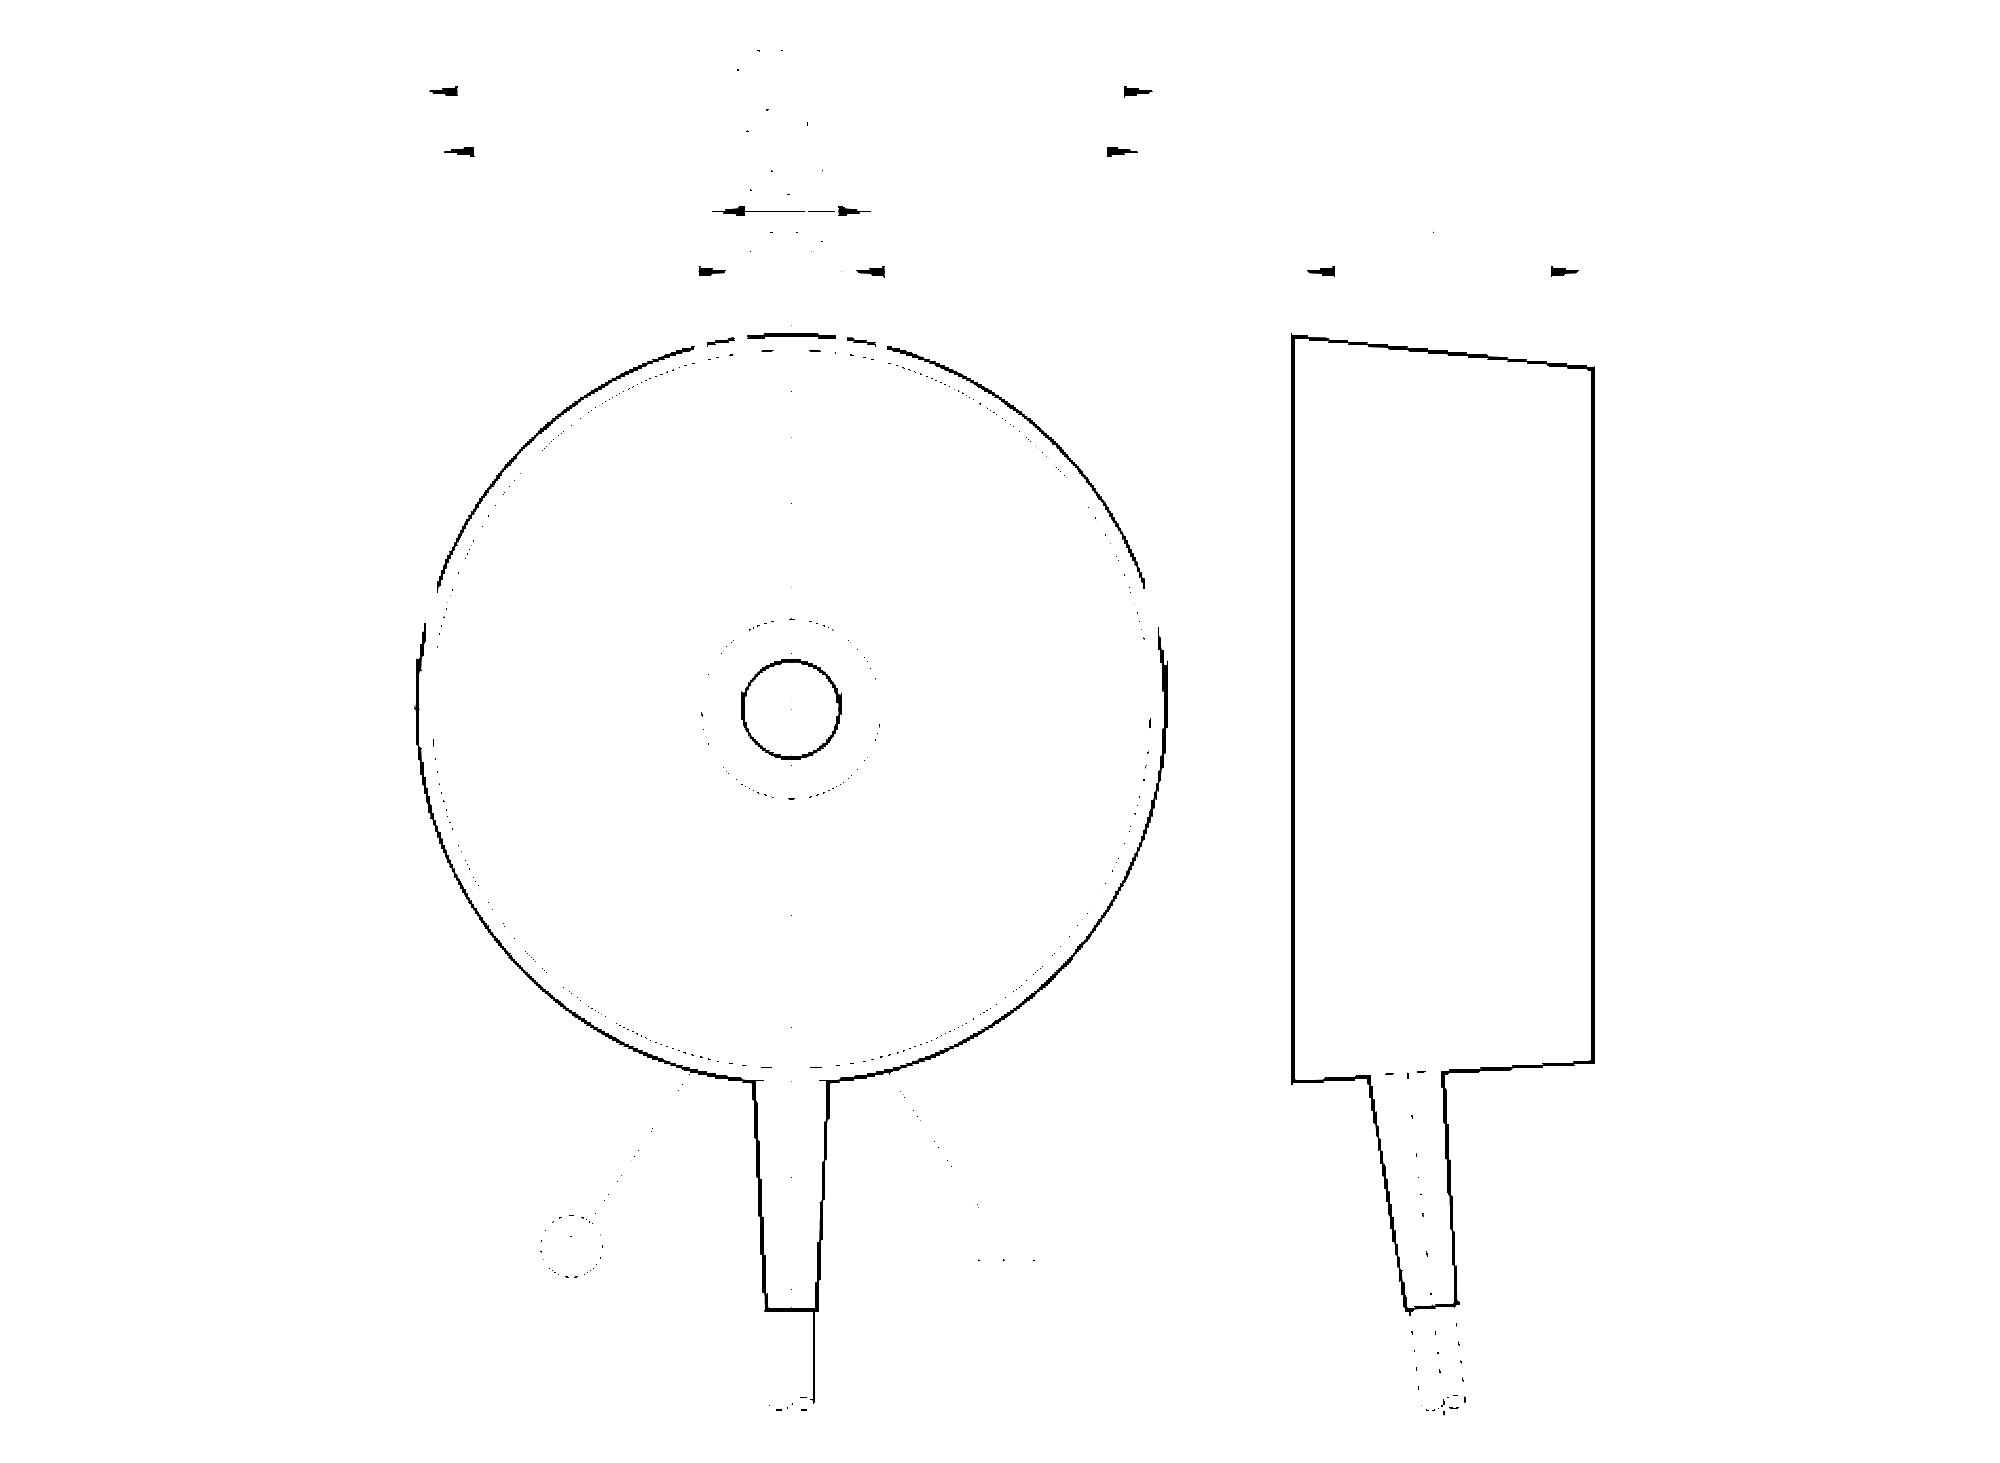 i12001 - inductive area sensor